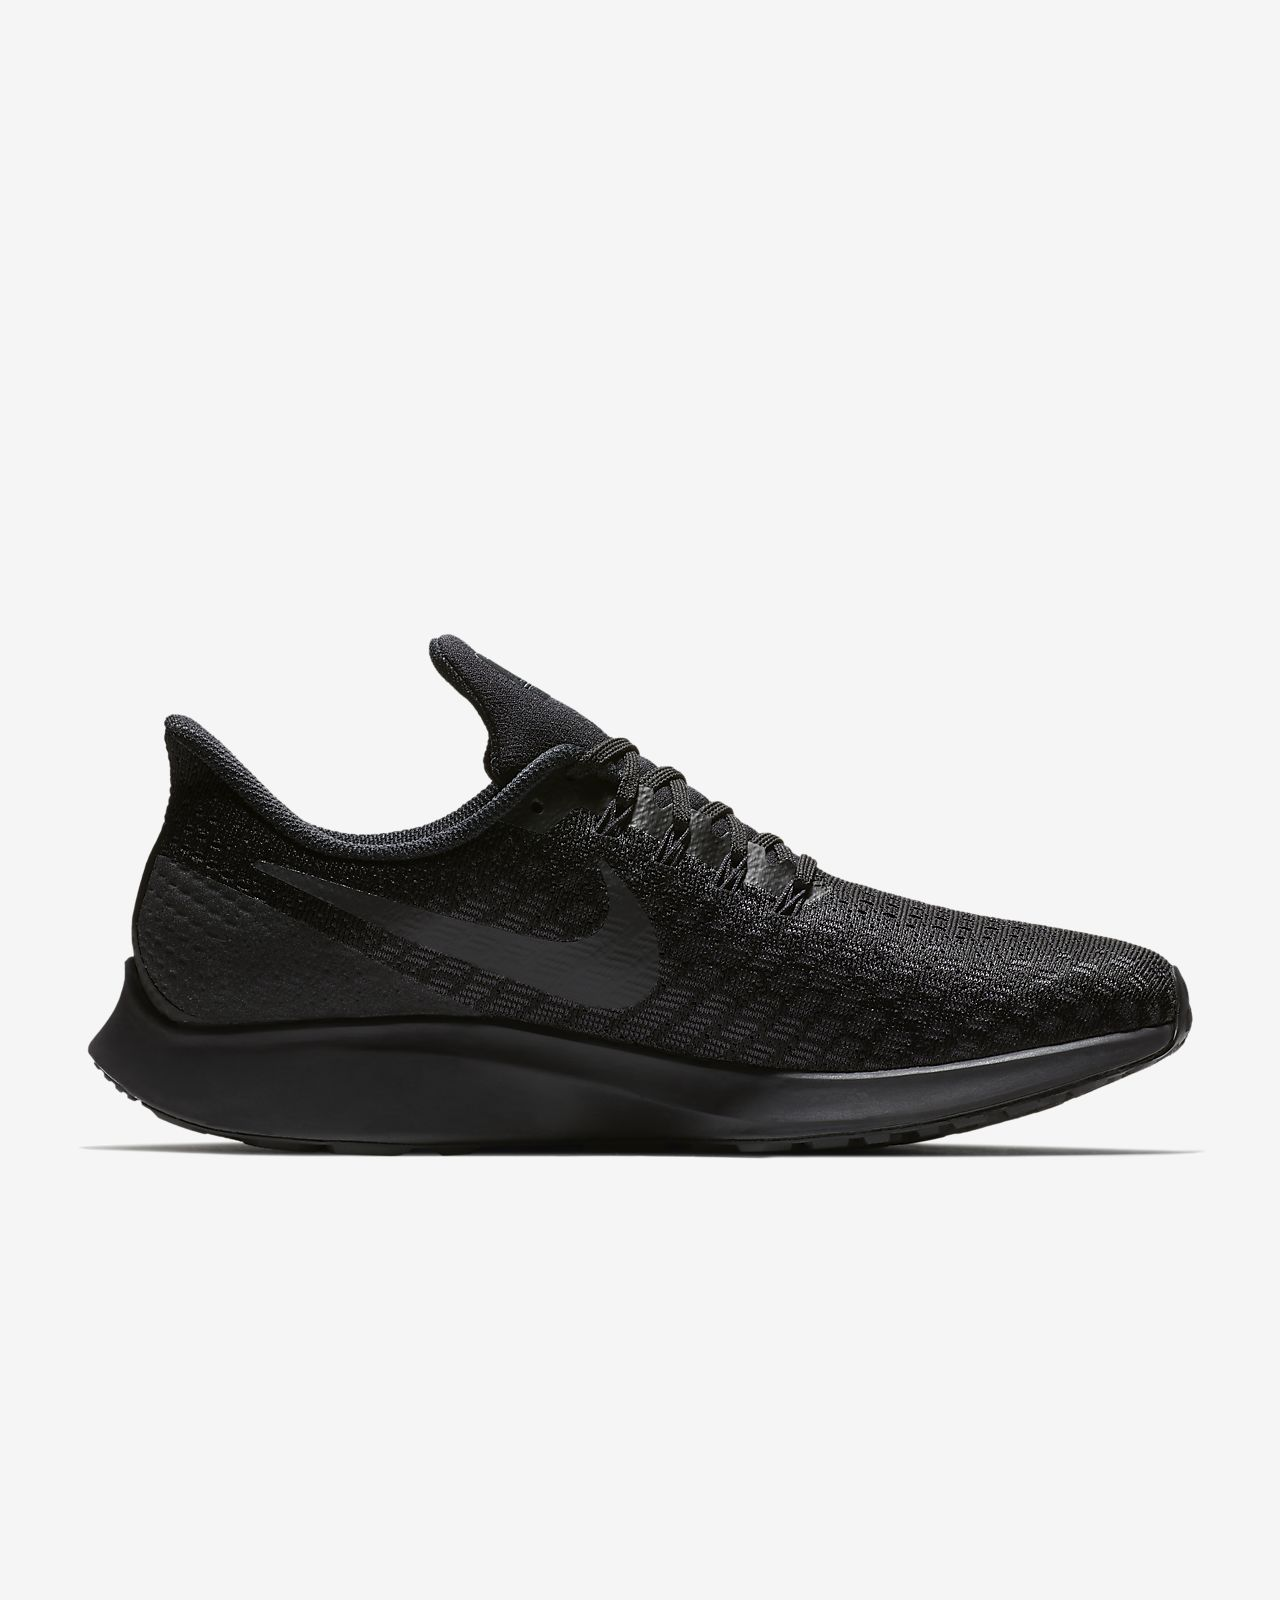 meet 0316e b7fef Low Resolution Nike Air Zoom Pegasus 35 Men s Running Shoe Nike Air Zoom  Pegasus 35 Men s Running Shoe